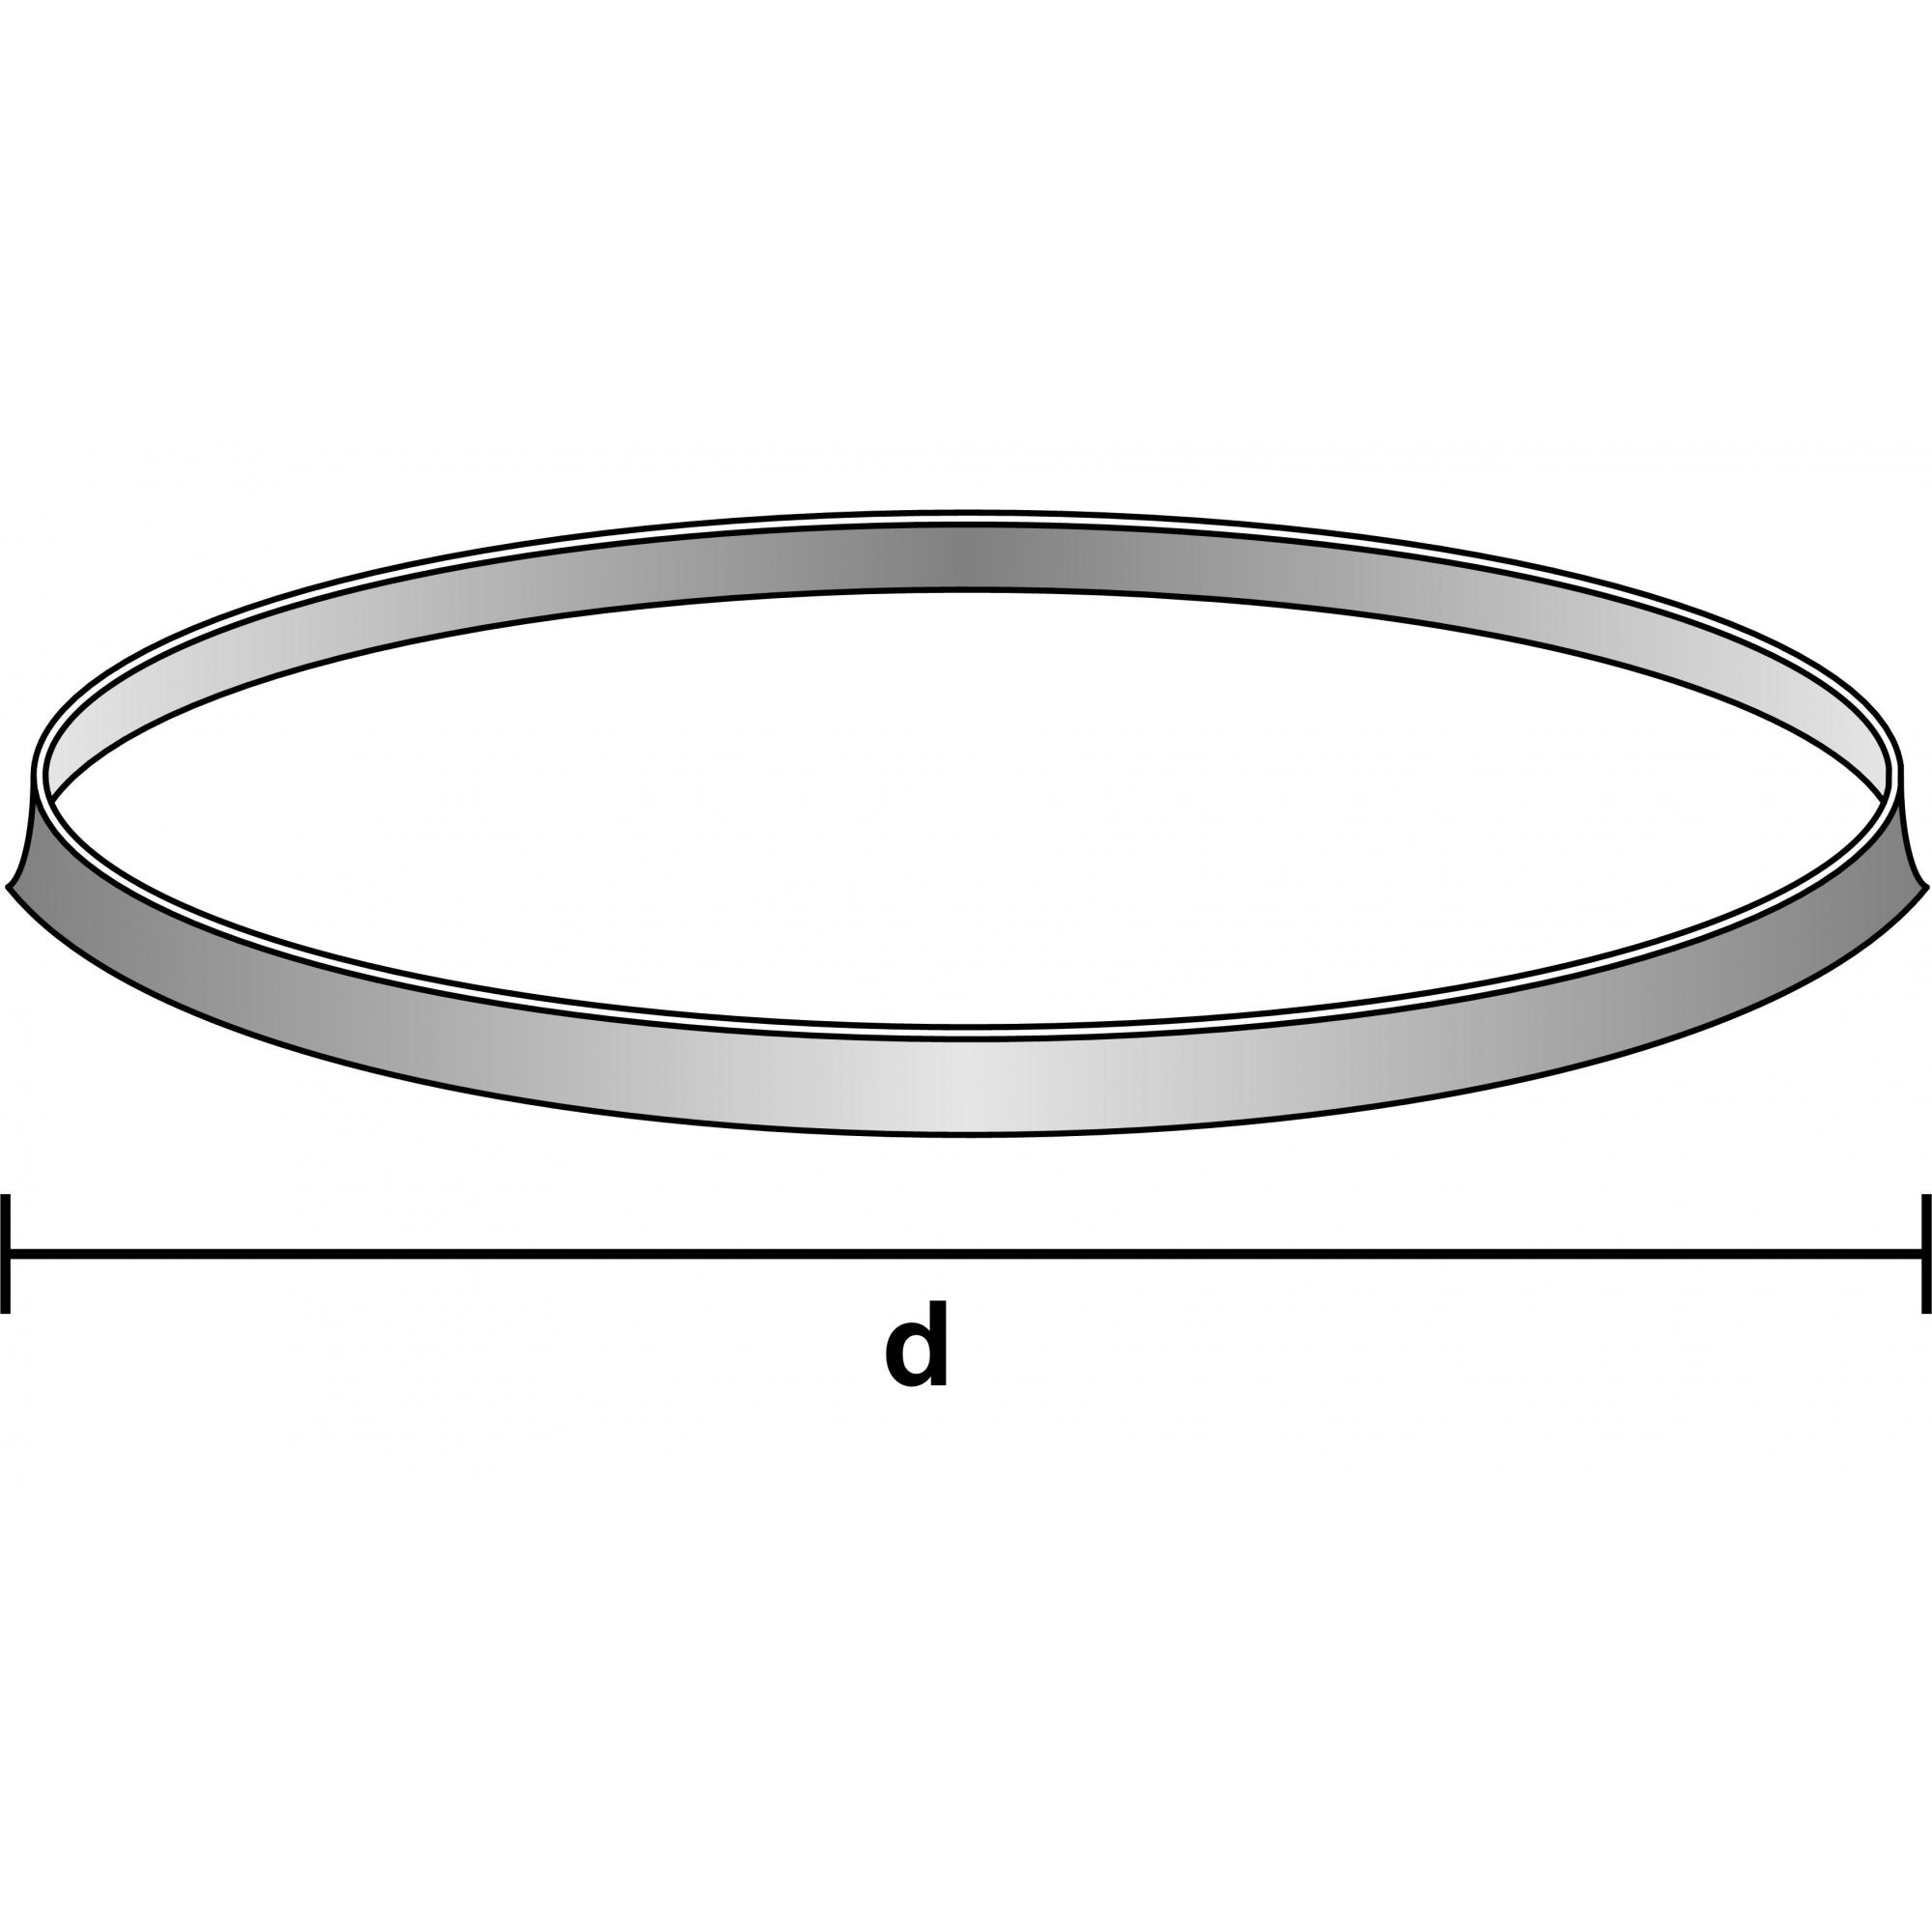 ANEL ORING EM POLIPROPILENO AZUL GL 45 - Laborglas - Cód. 9924228